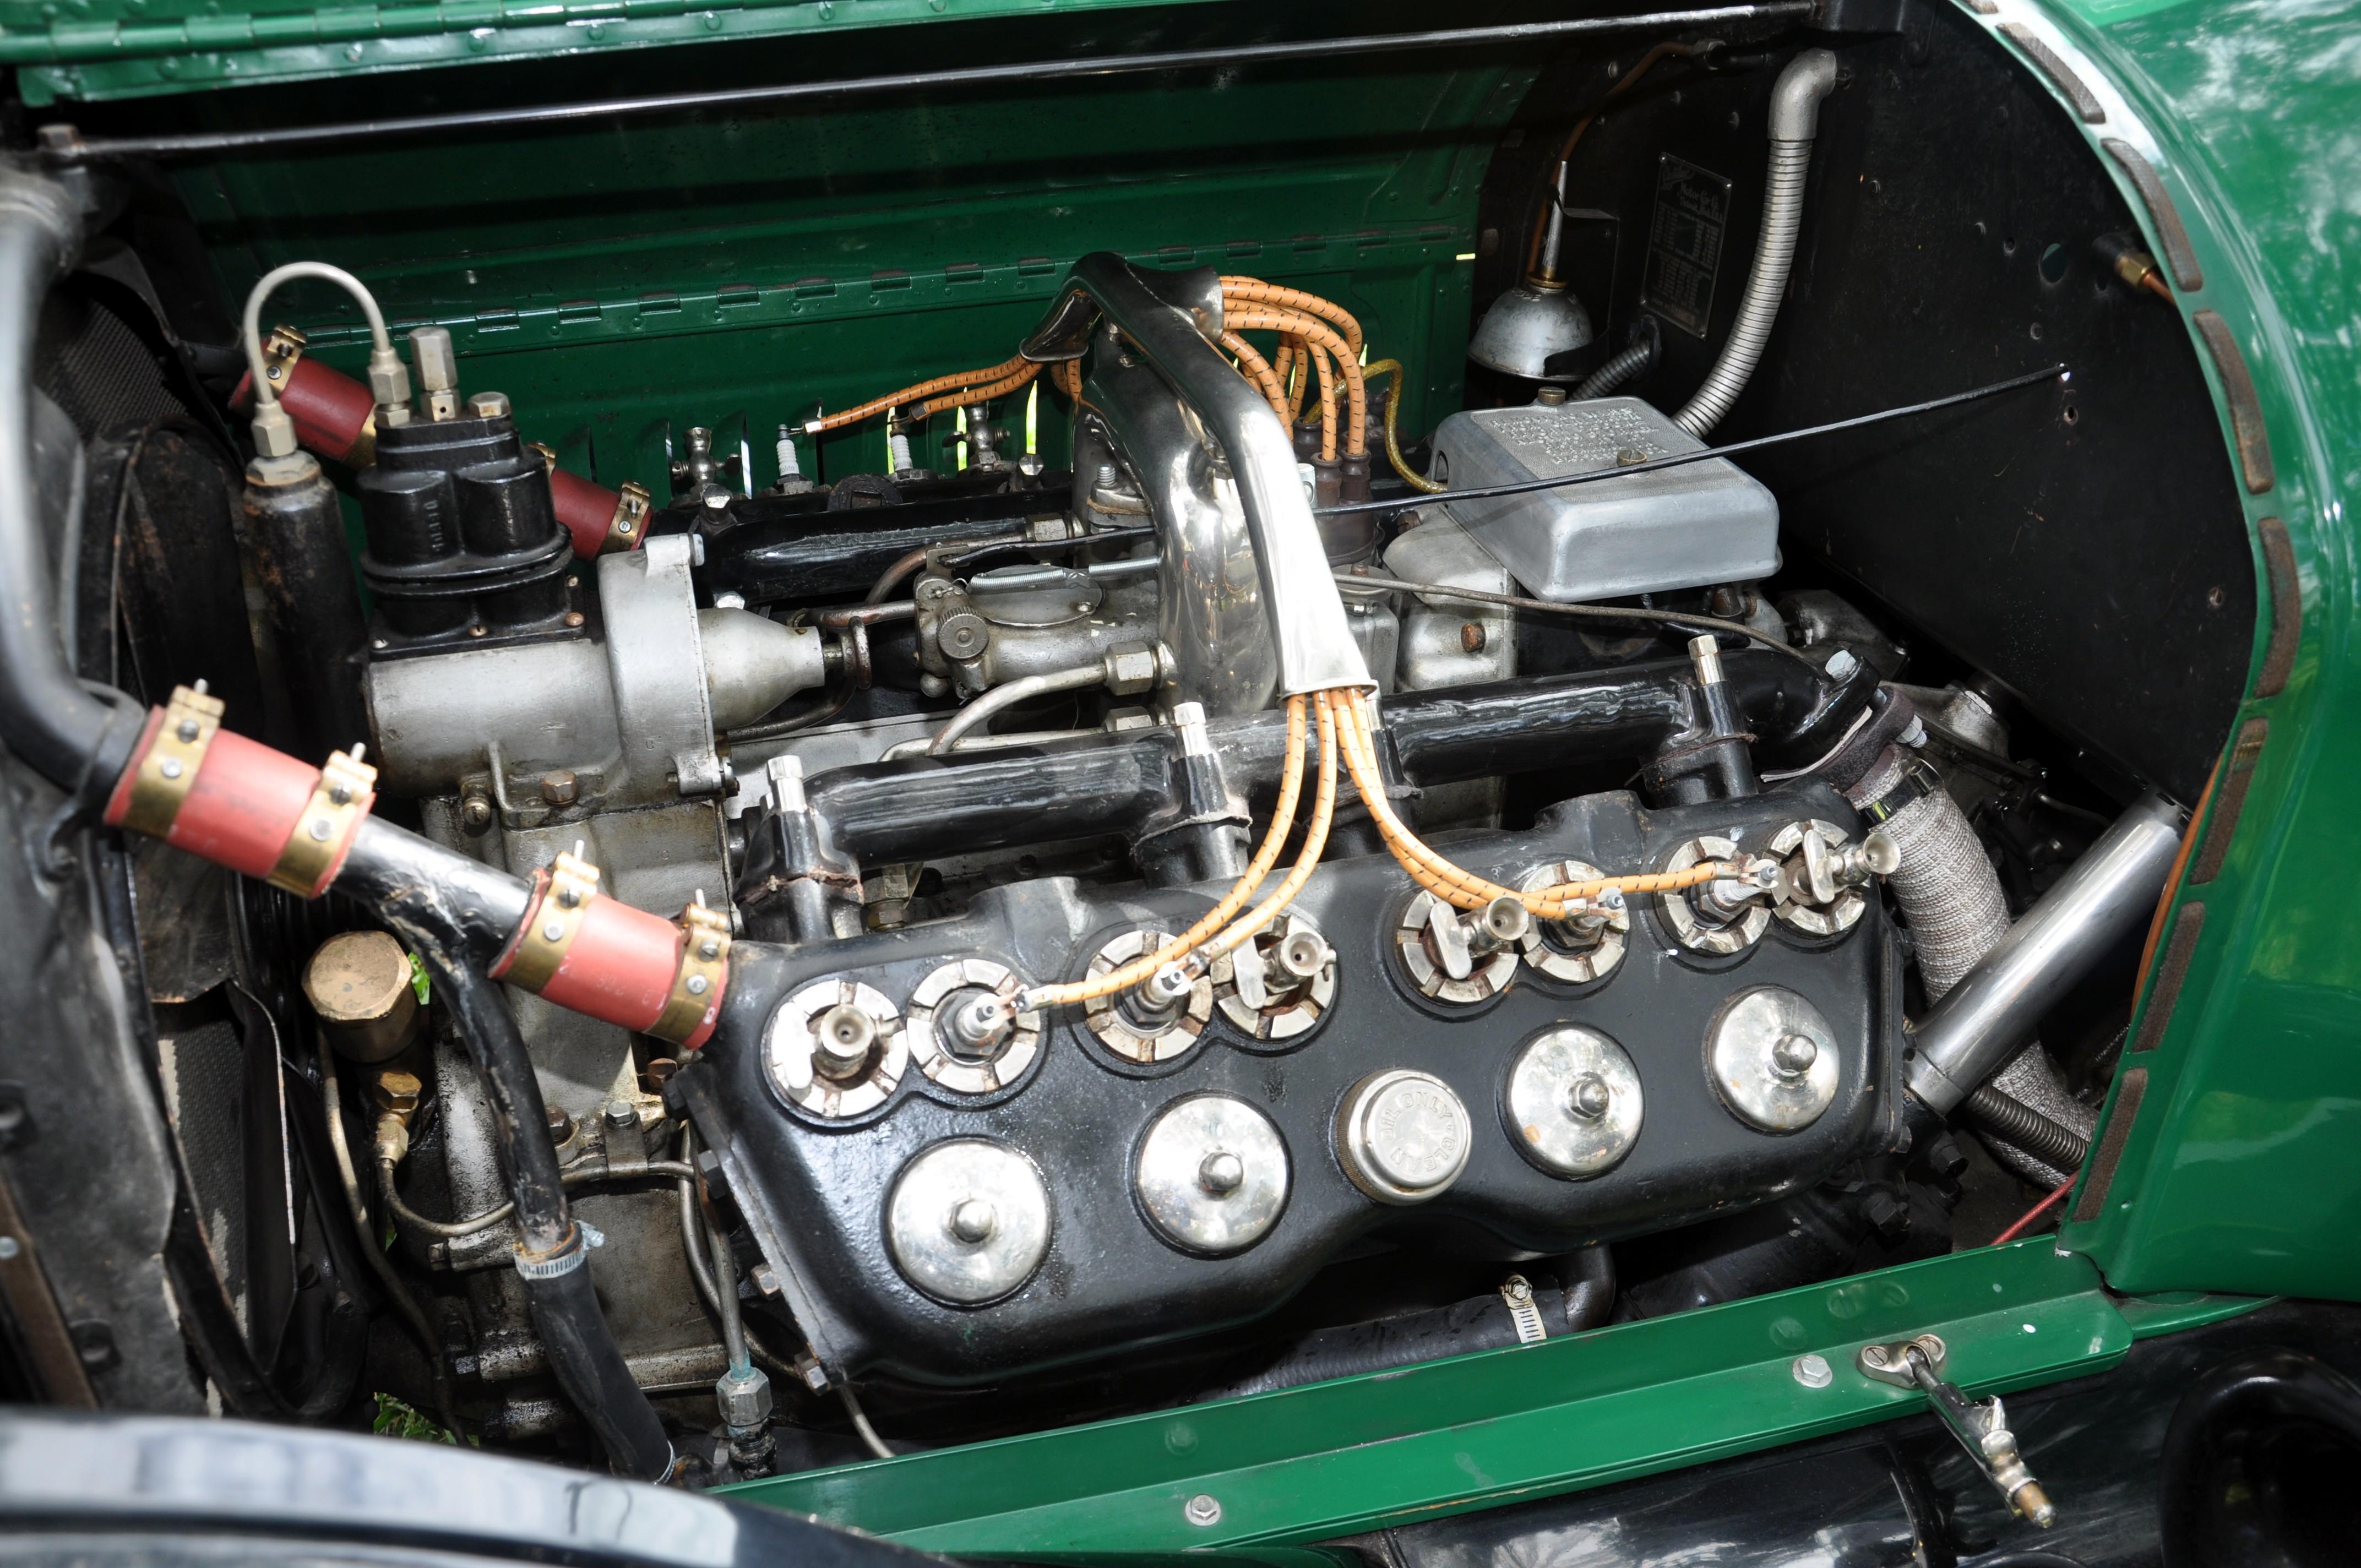 Cadillac V8 engine Photo: Wikiwand